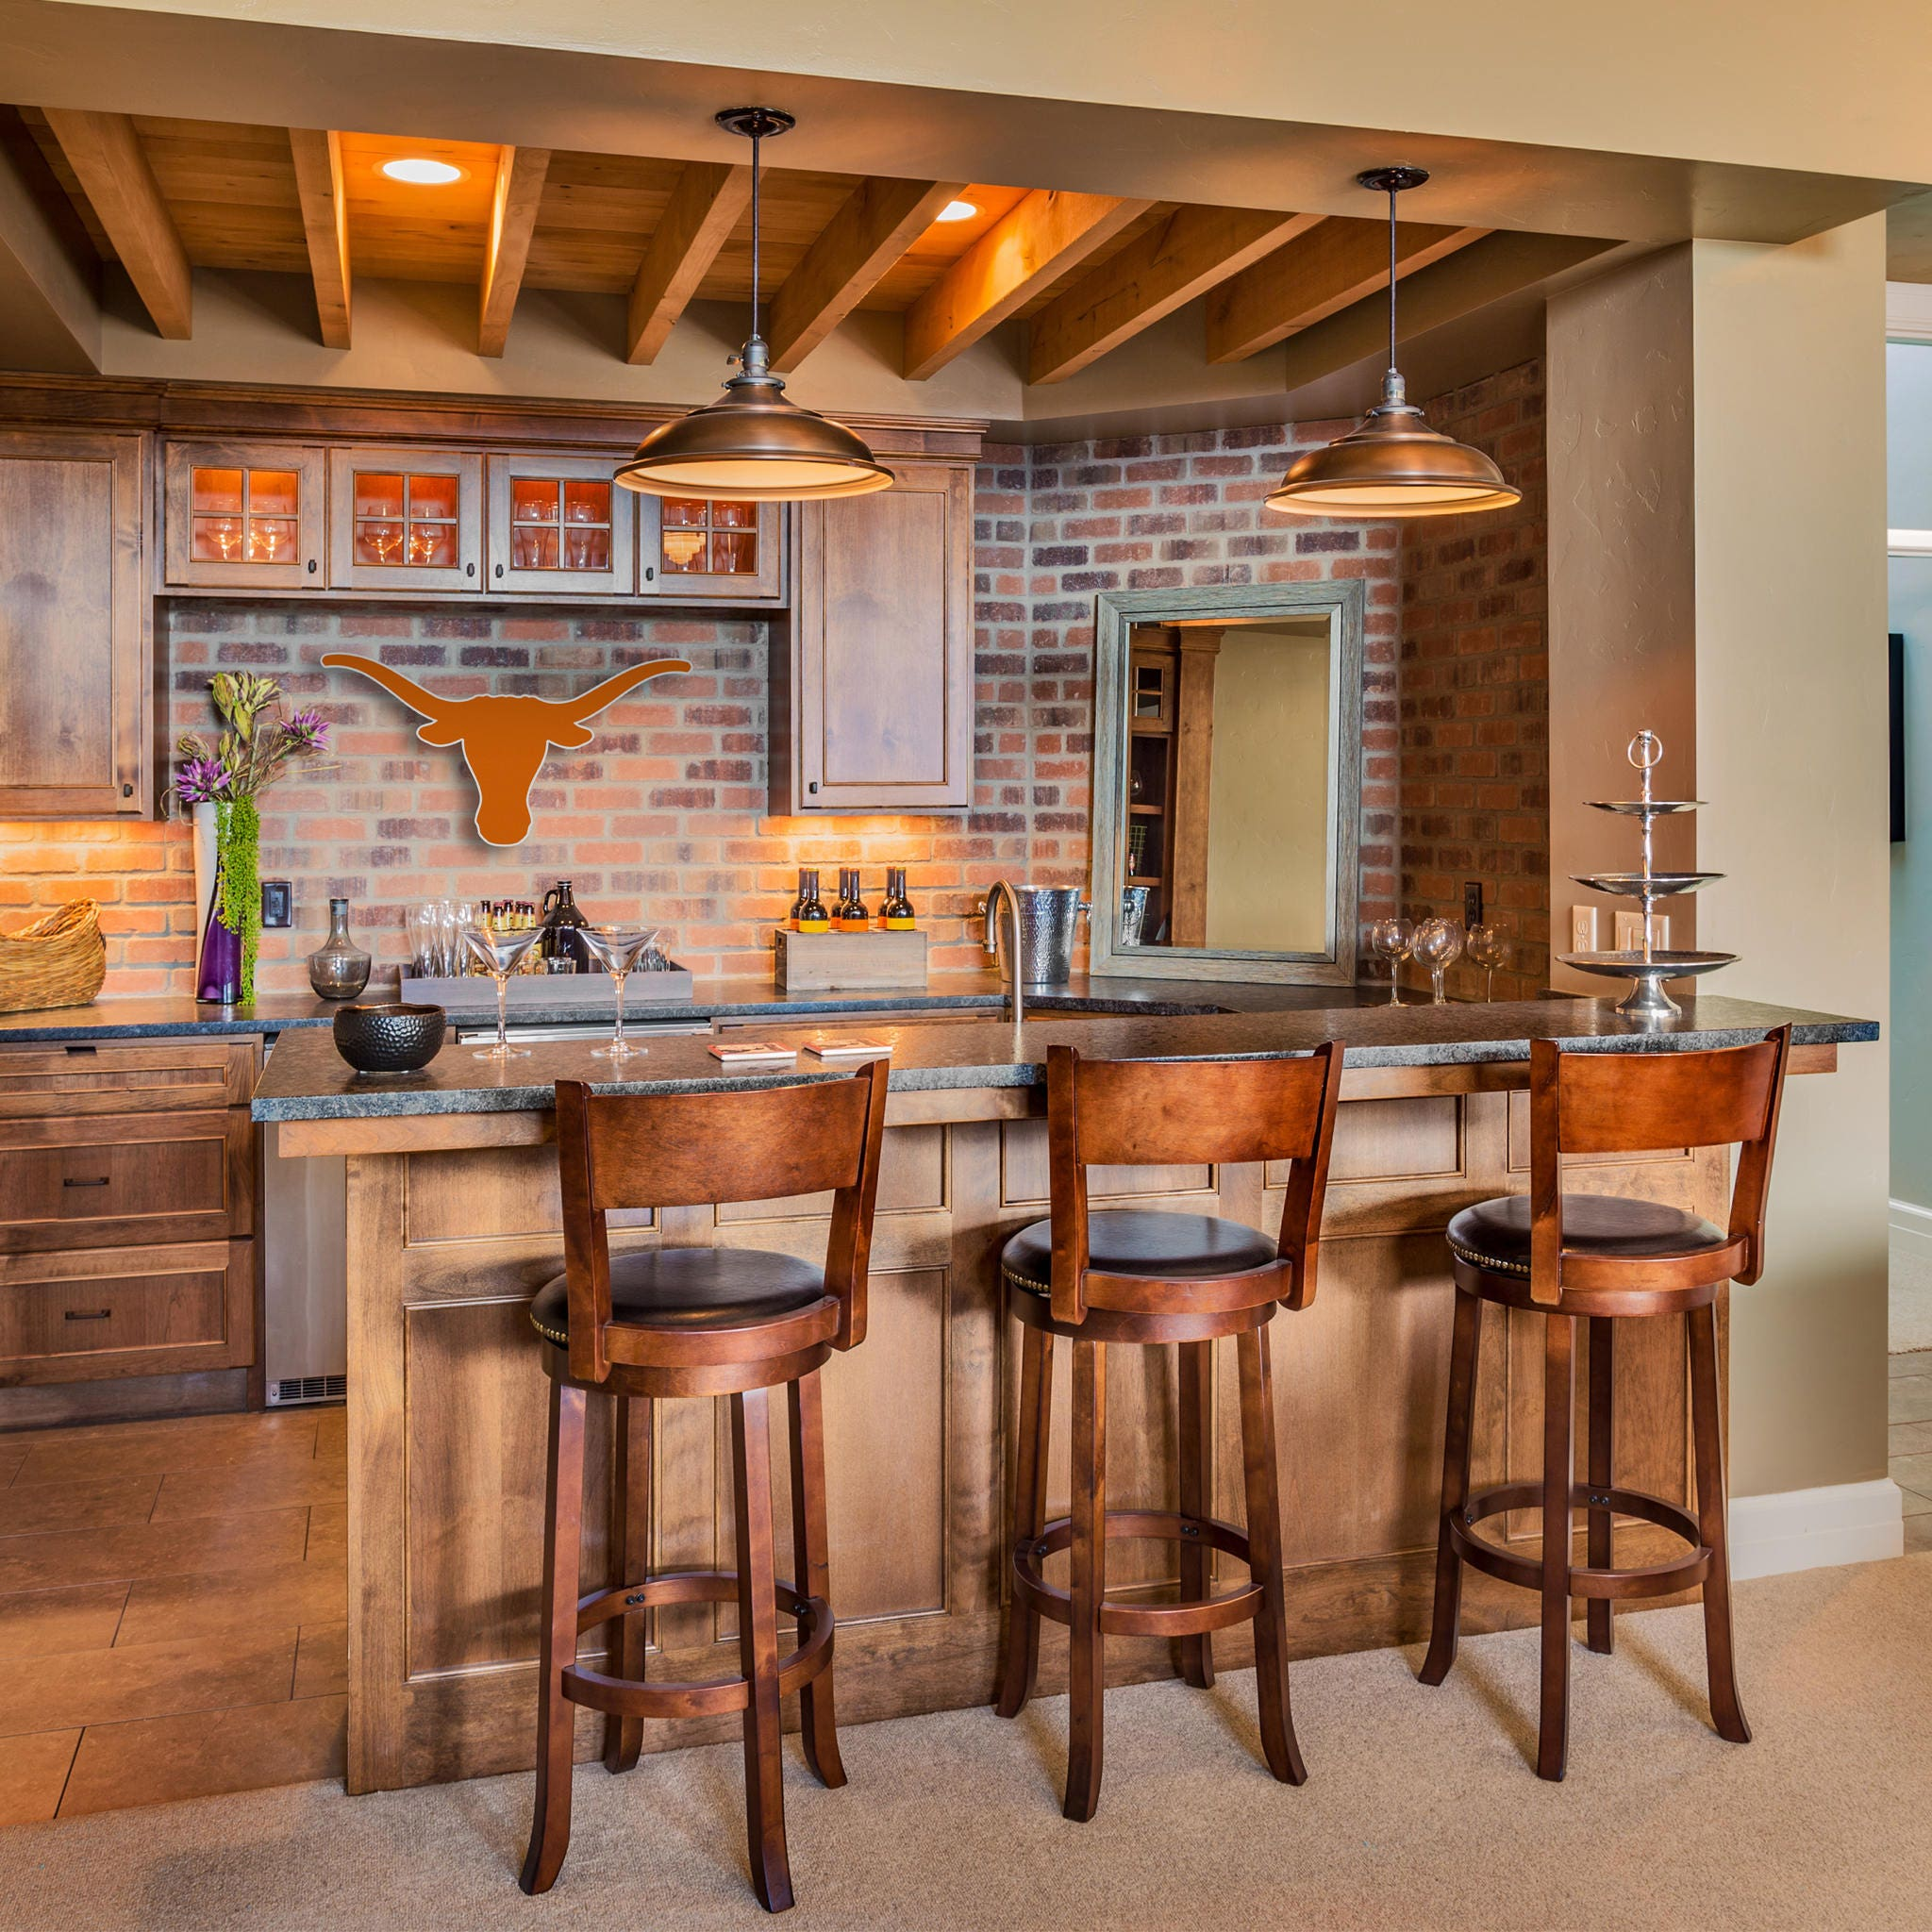 Texas Longhorns Decor|Wall Decor|Boy Room Decor|Boy Football Decor ...